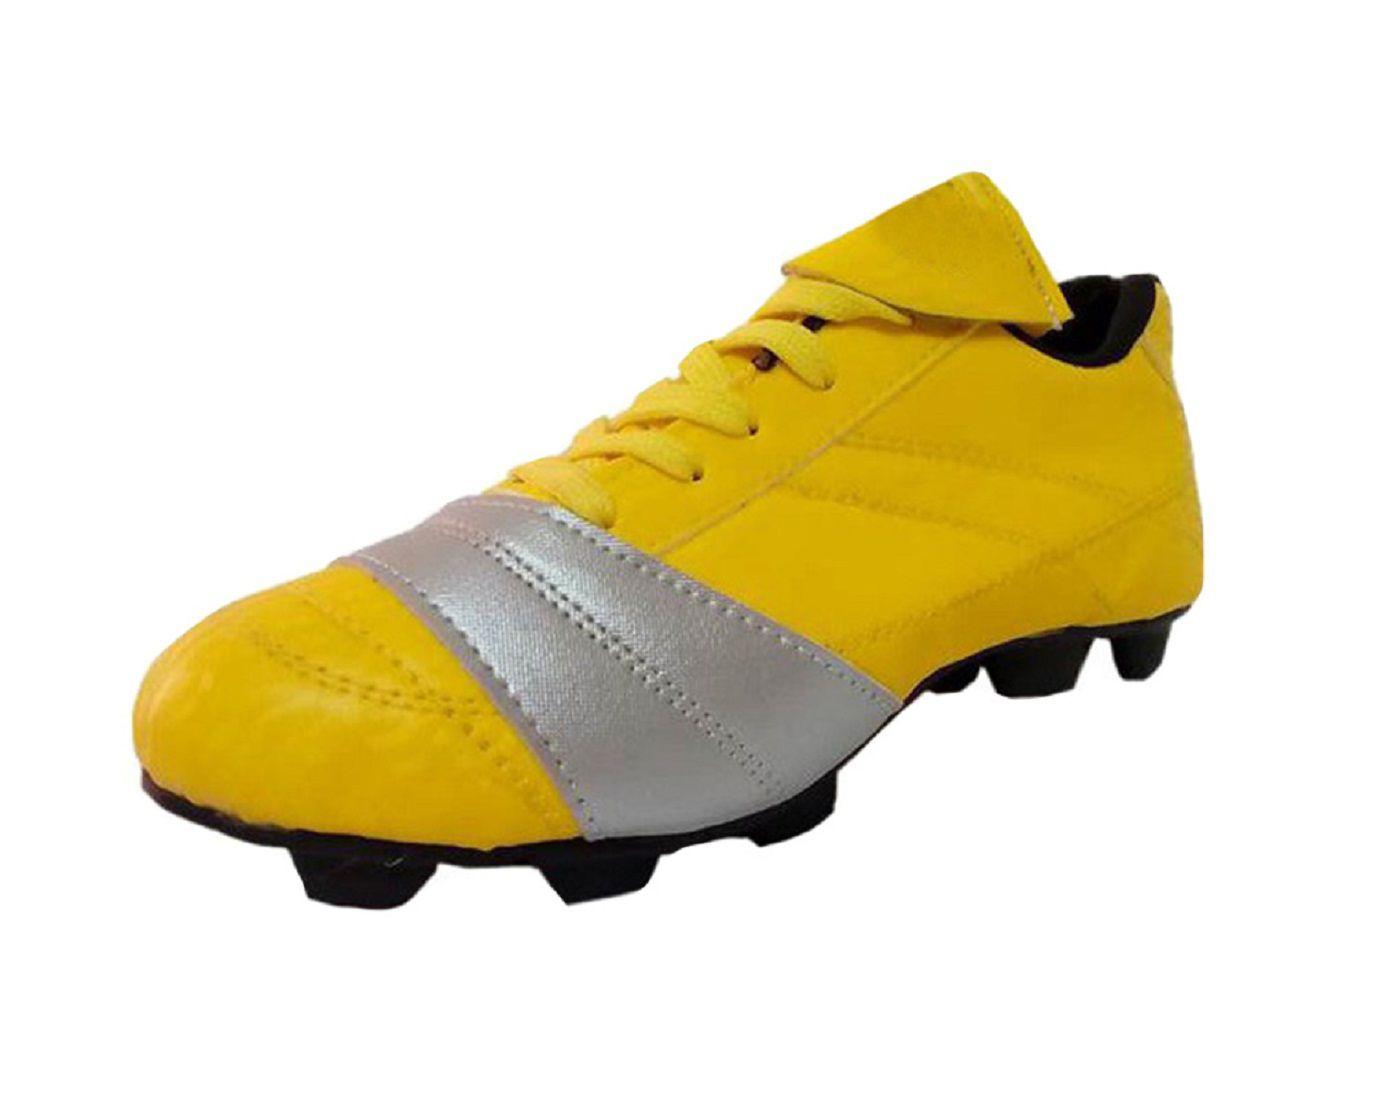 Comex NITRO Yellow Football Shoes